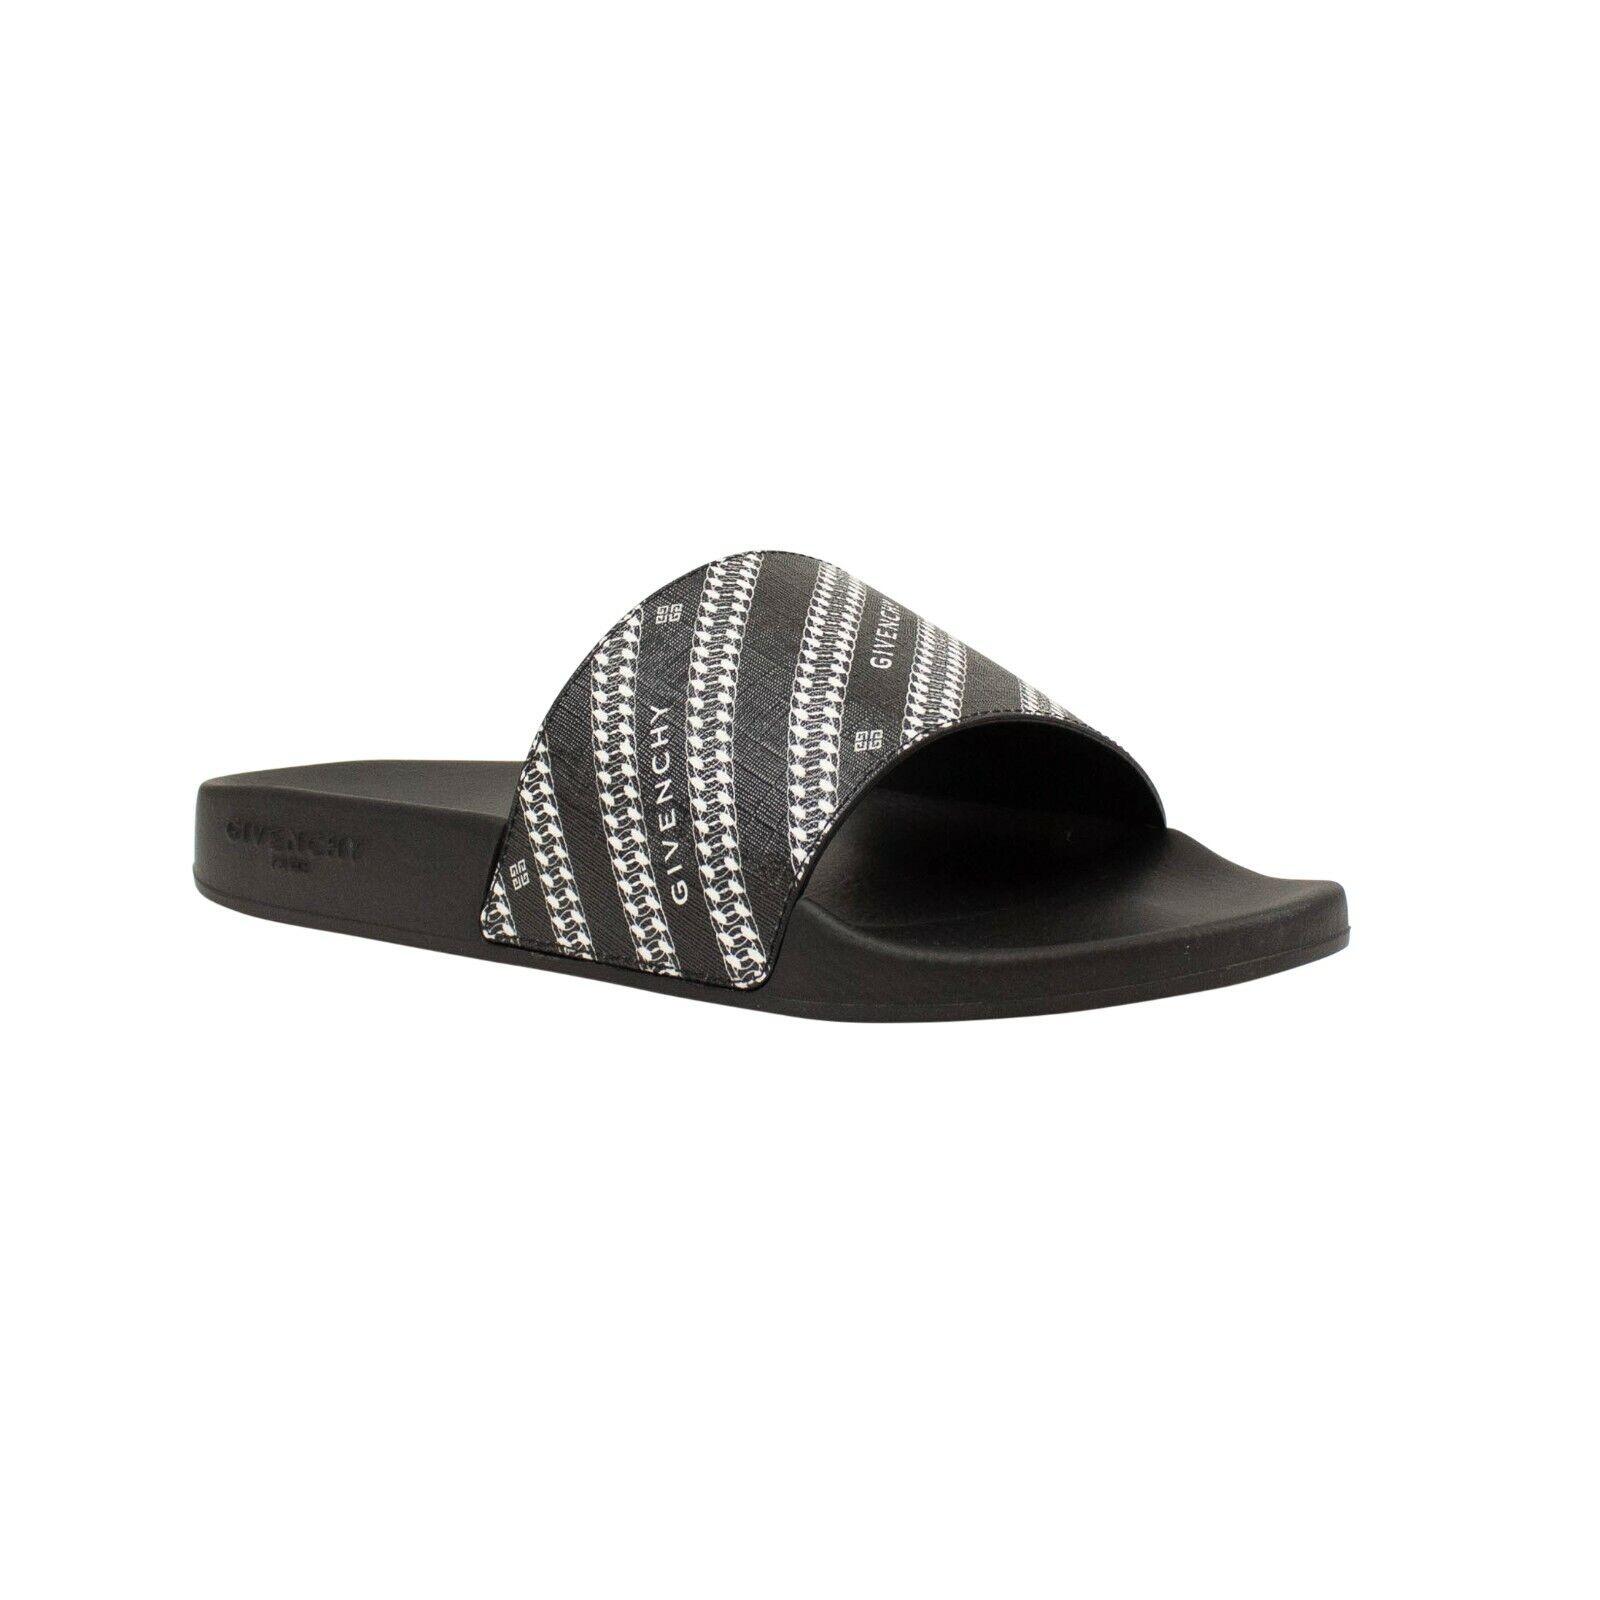 NIB GIVENCHY Black/White Buckle GIV Slide Sandals Size 8/41